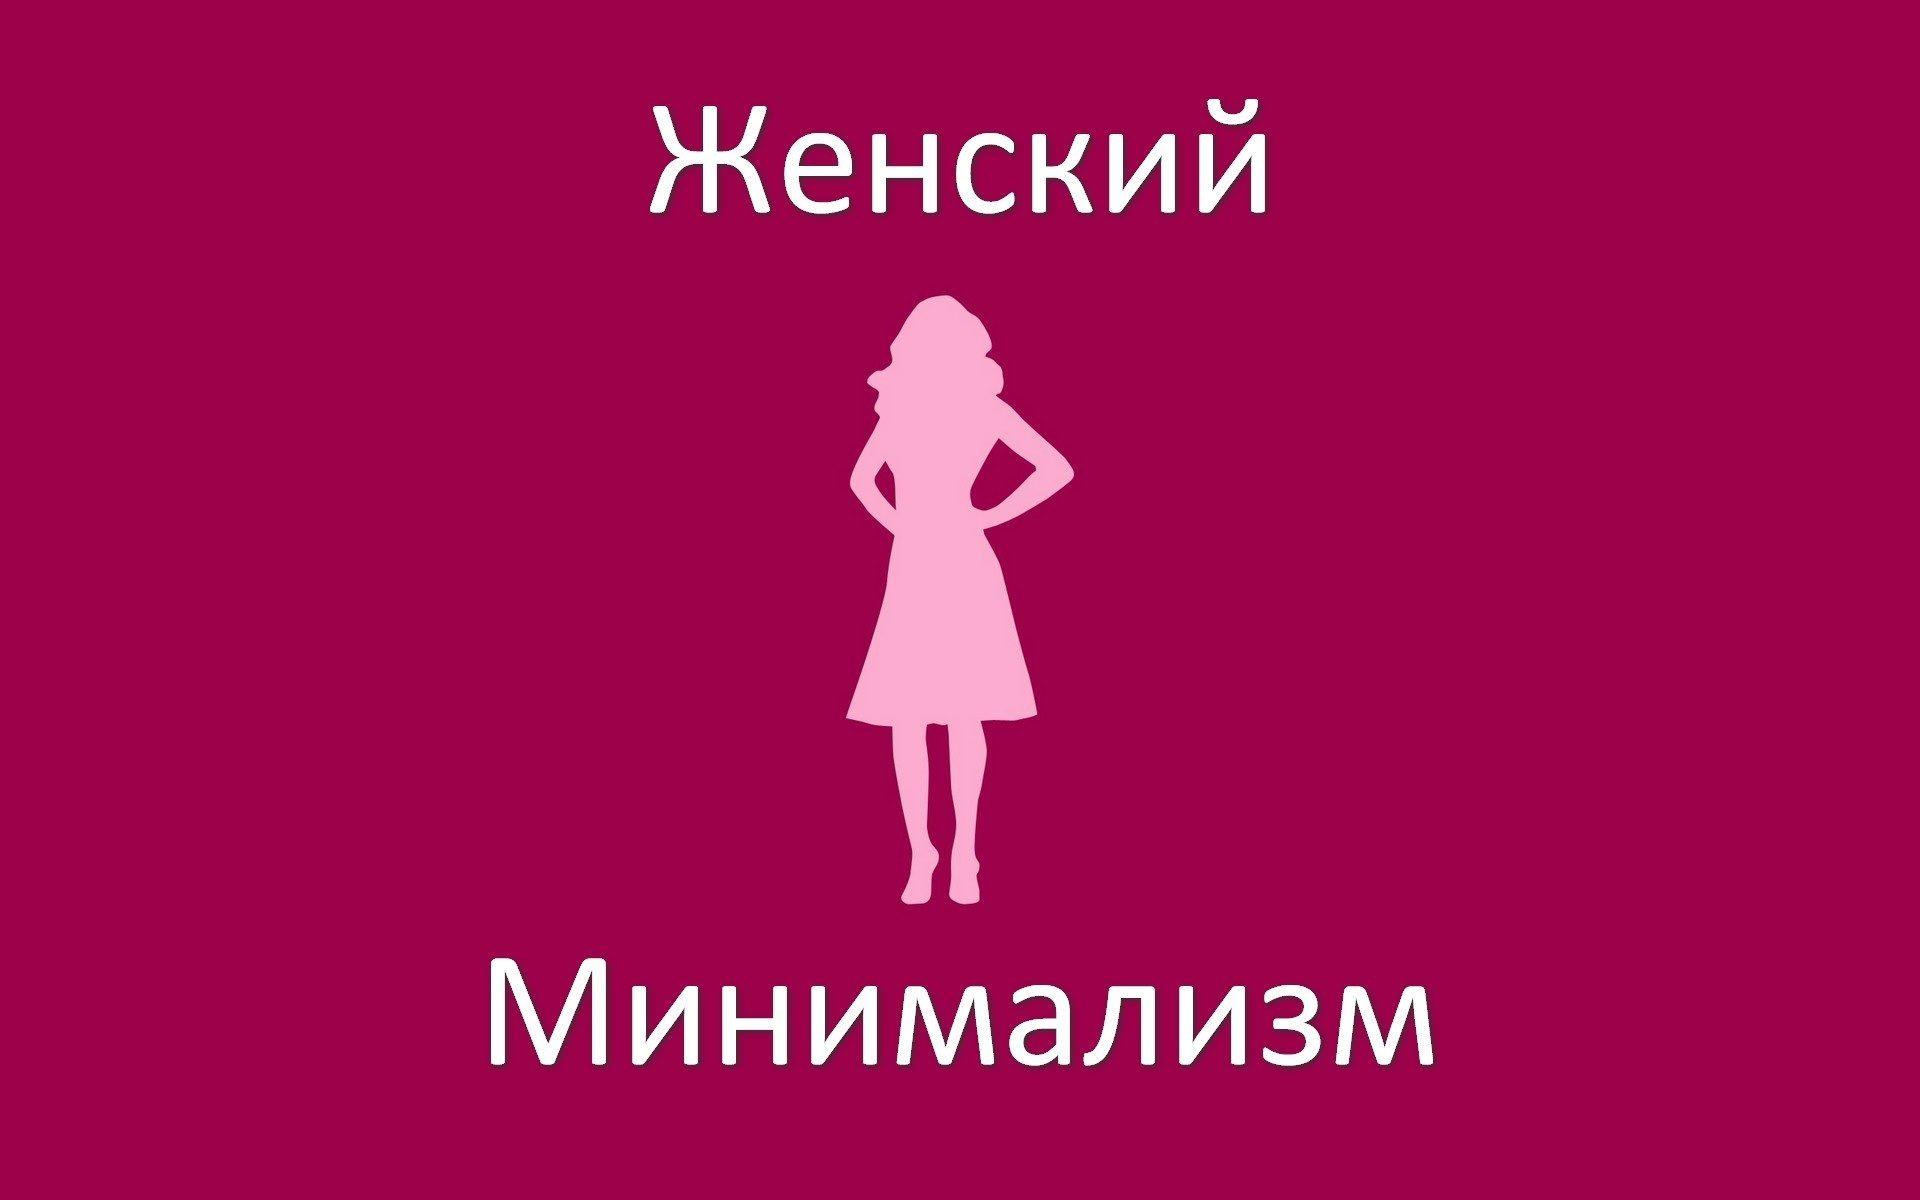 Женский минимализм